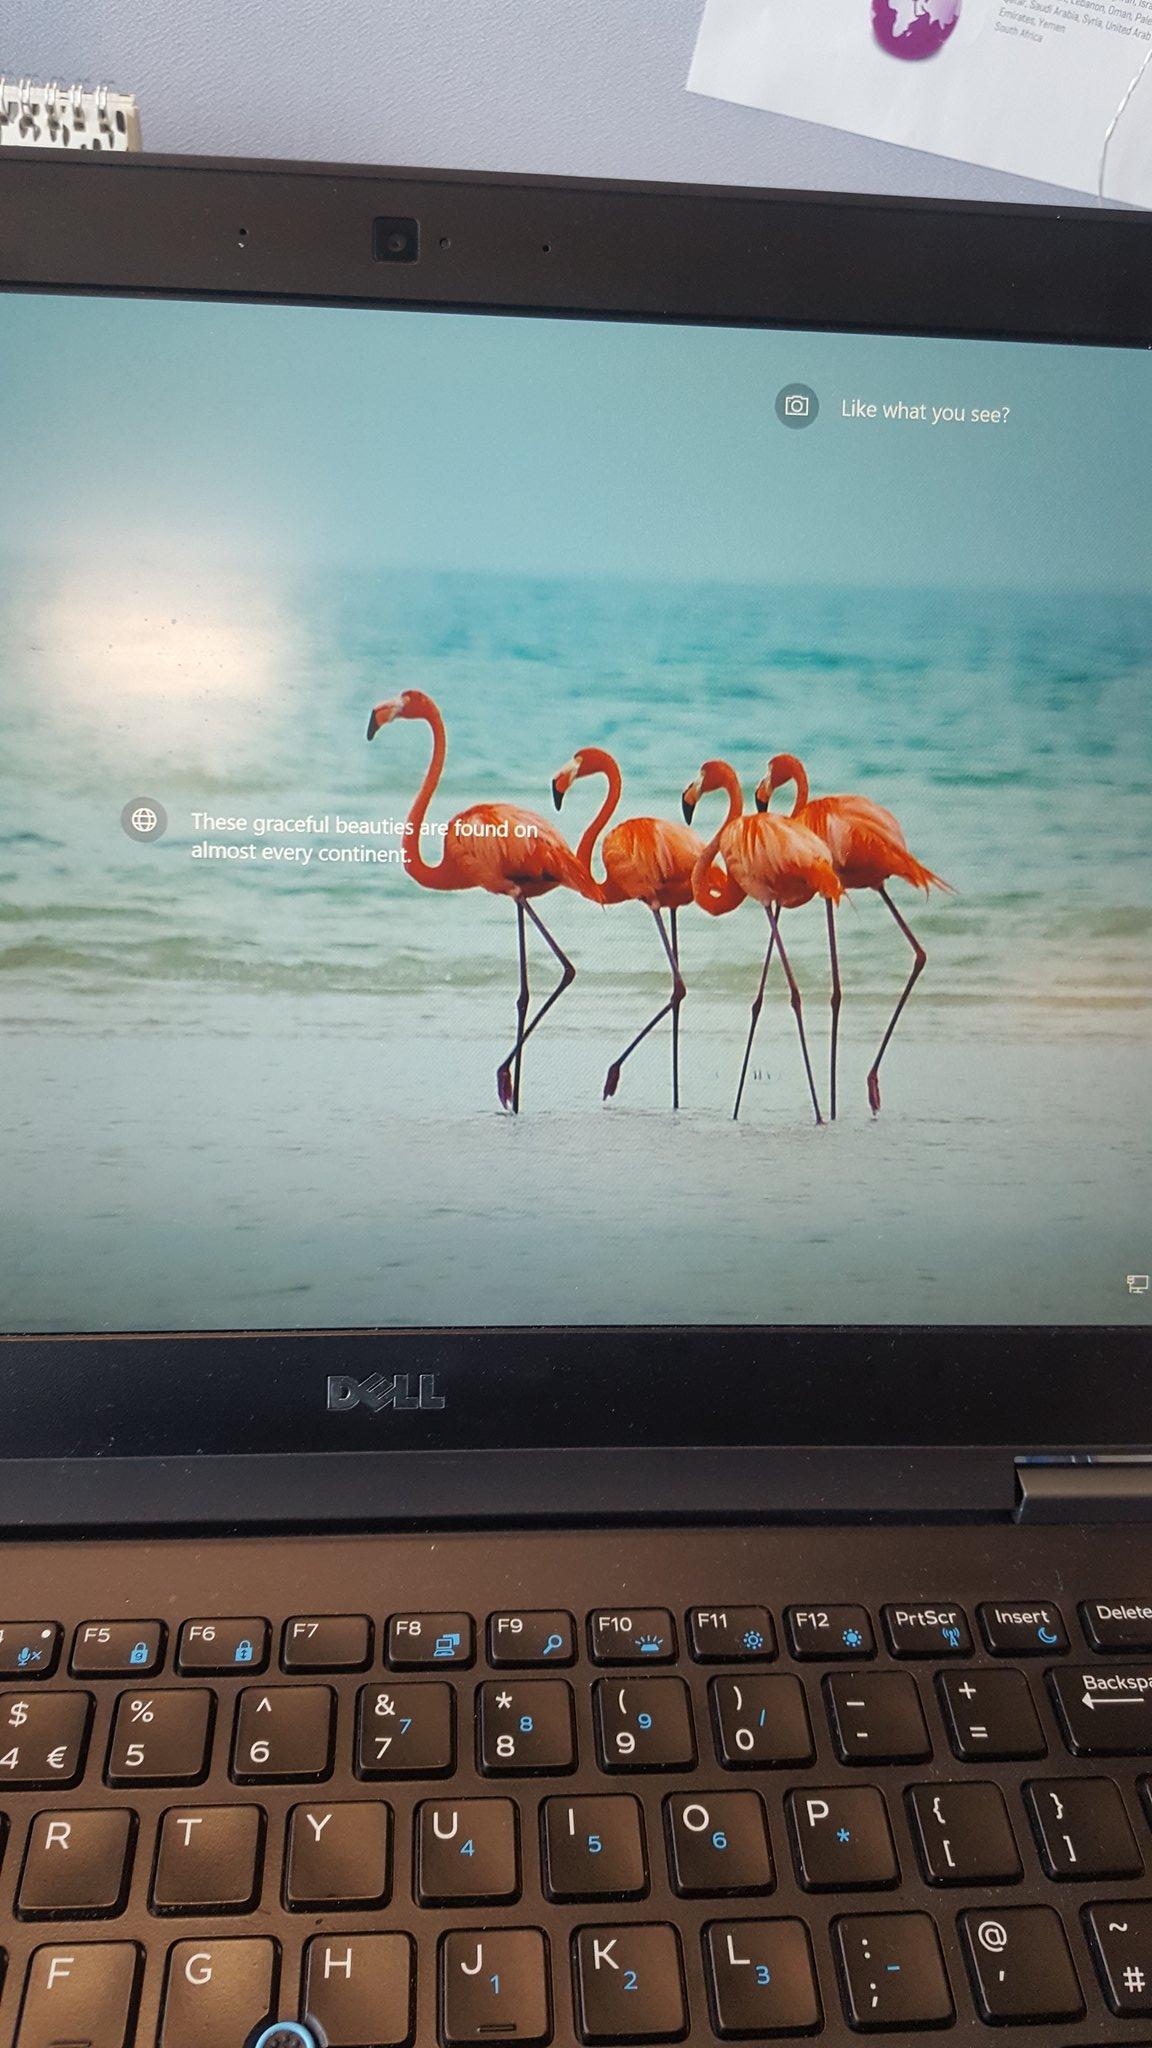 RT @NicCee1: Even my laptop knows what time it is! T - 2 days! #amplostandfound @AnnieMac @AMPlostandfound https://t.co/0SBPP0Ajz2